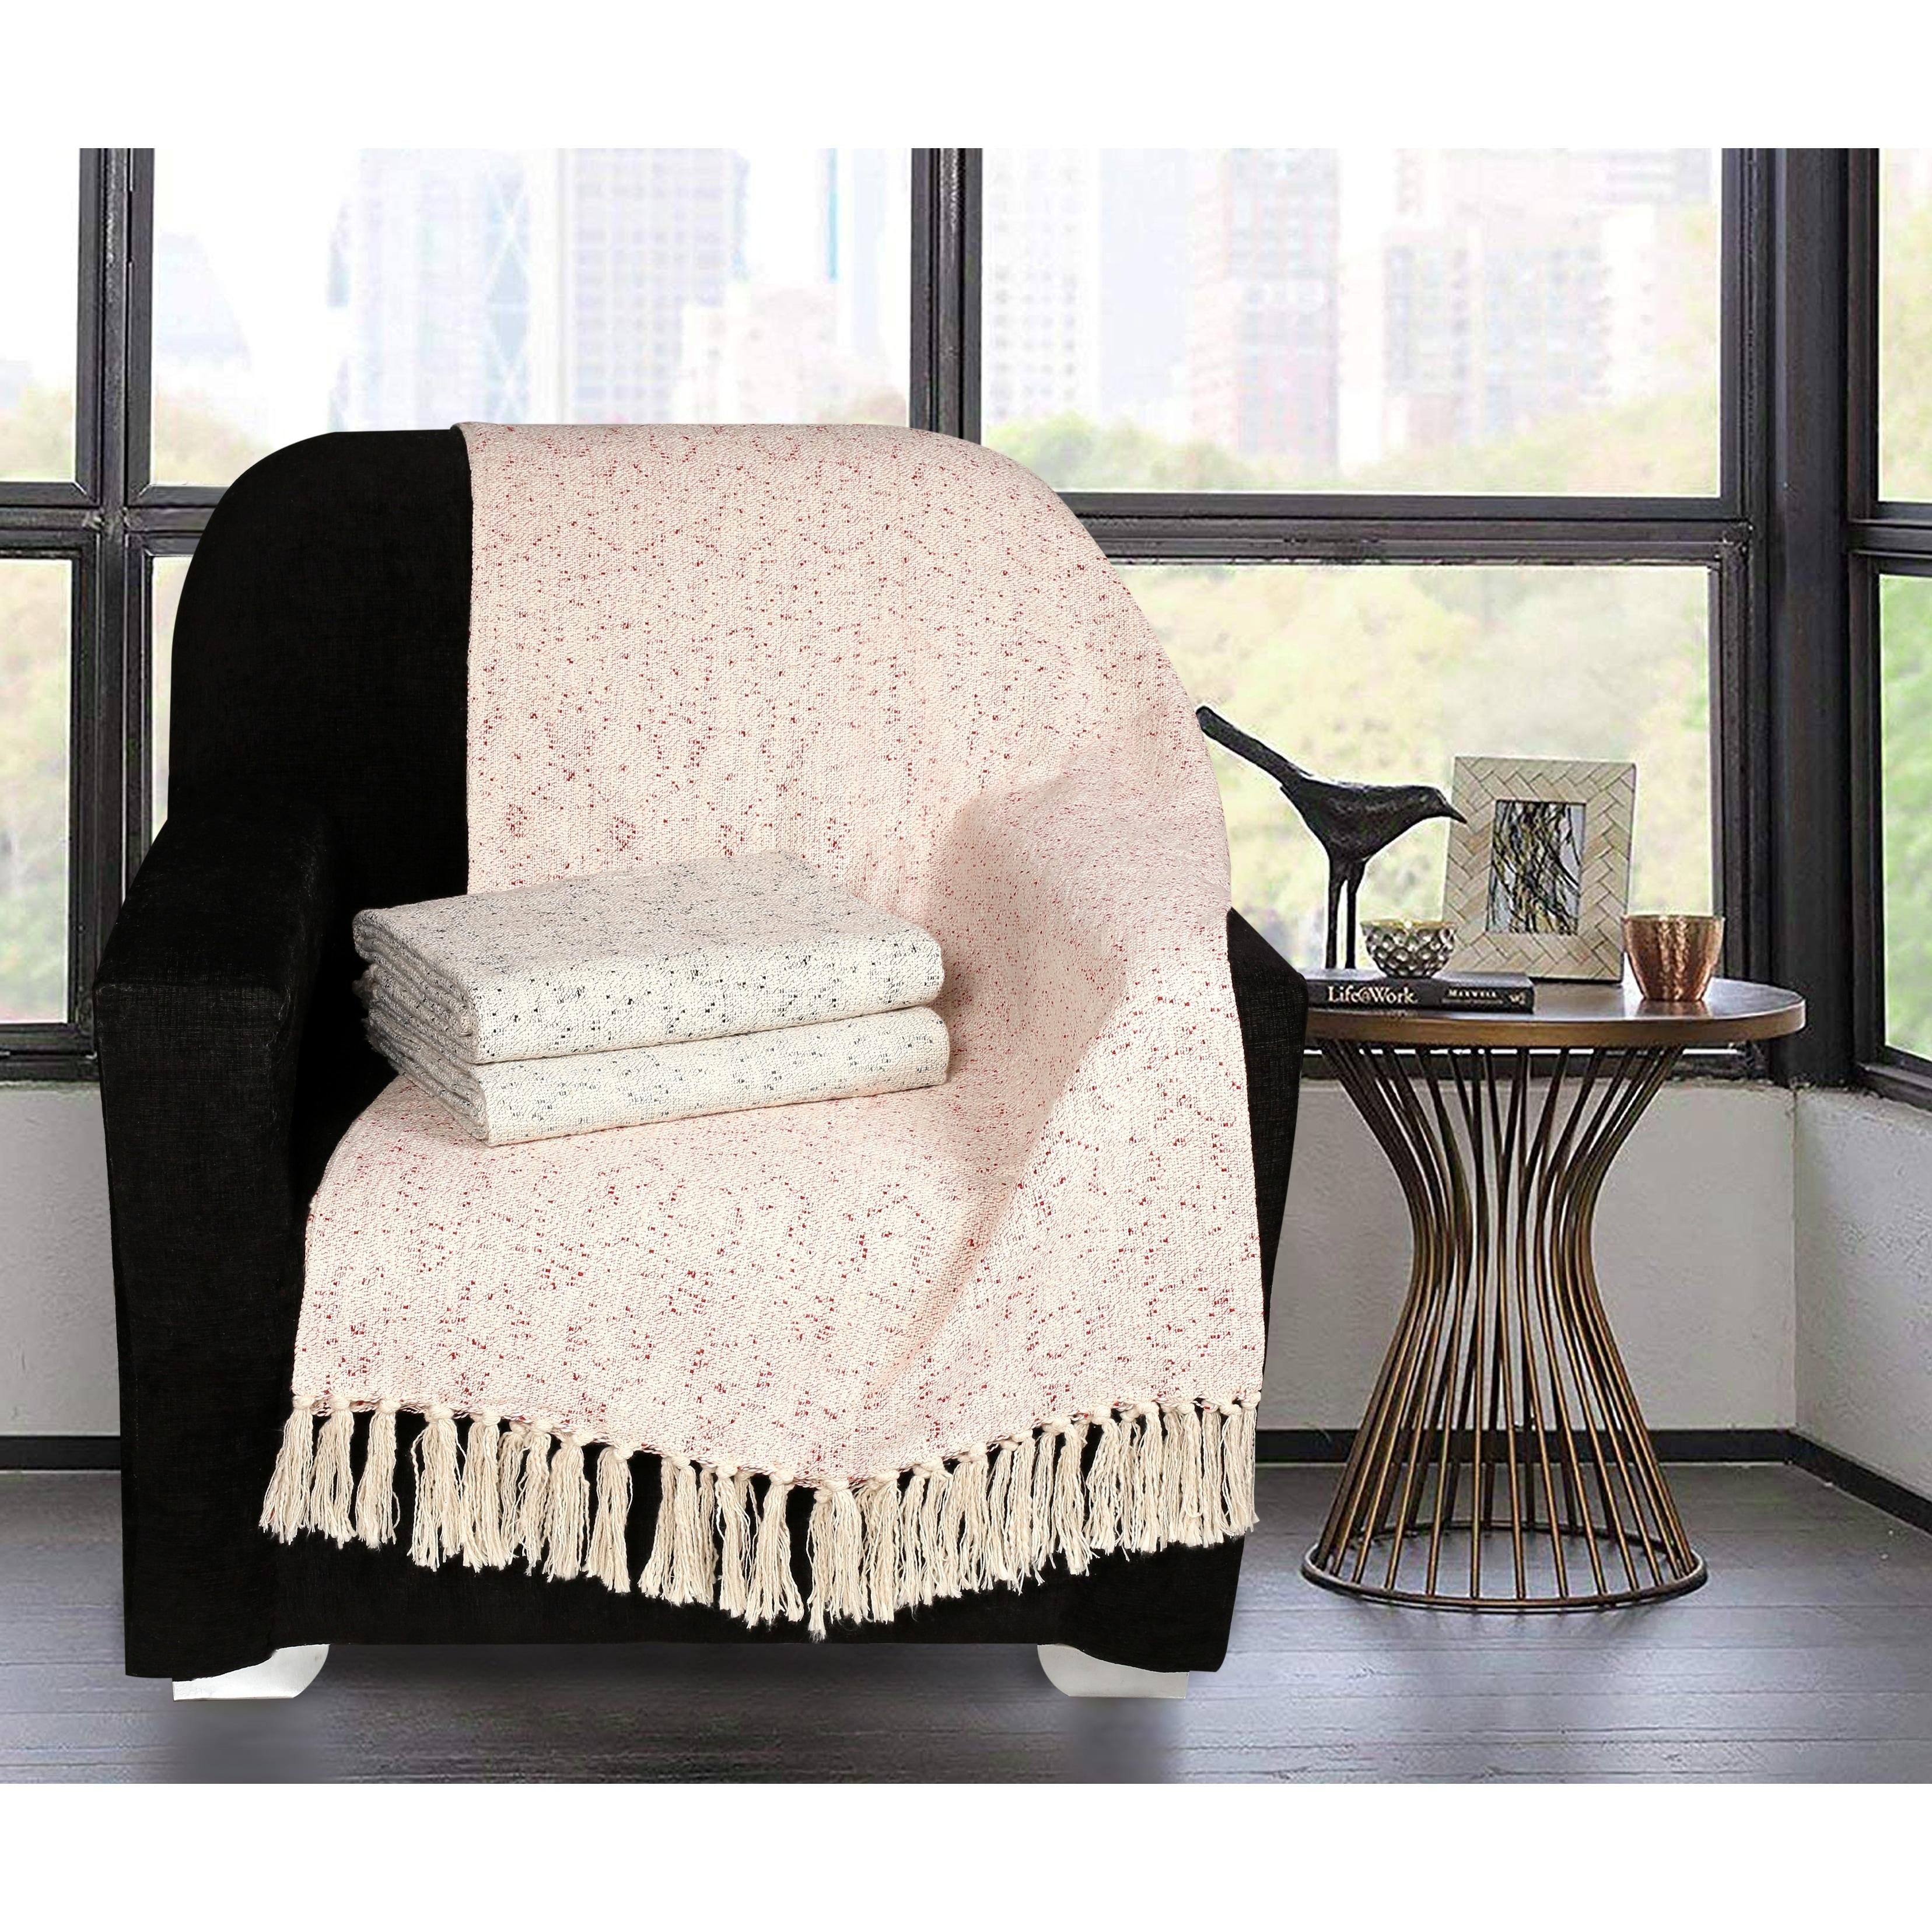 Glamburg Premium Quality /& Trendy- Slub Throw Blanket Beach /& Everyday Use Soft /& Cozy All Season Throw Blanket for Sofa Picnic Camping 50x60 Inches Couch Pure Cotton Chair Warm Teal